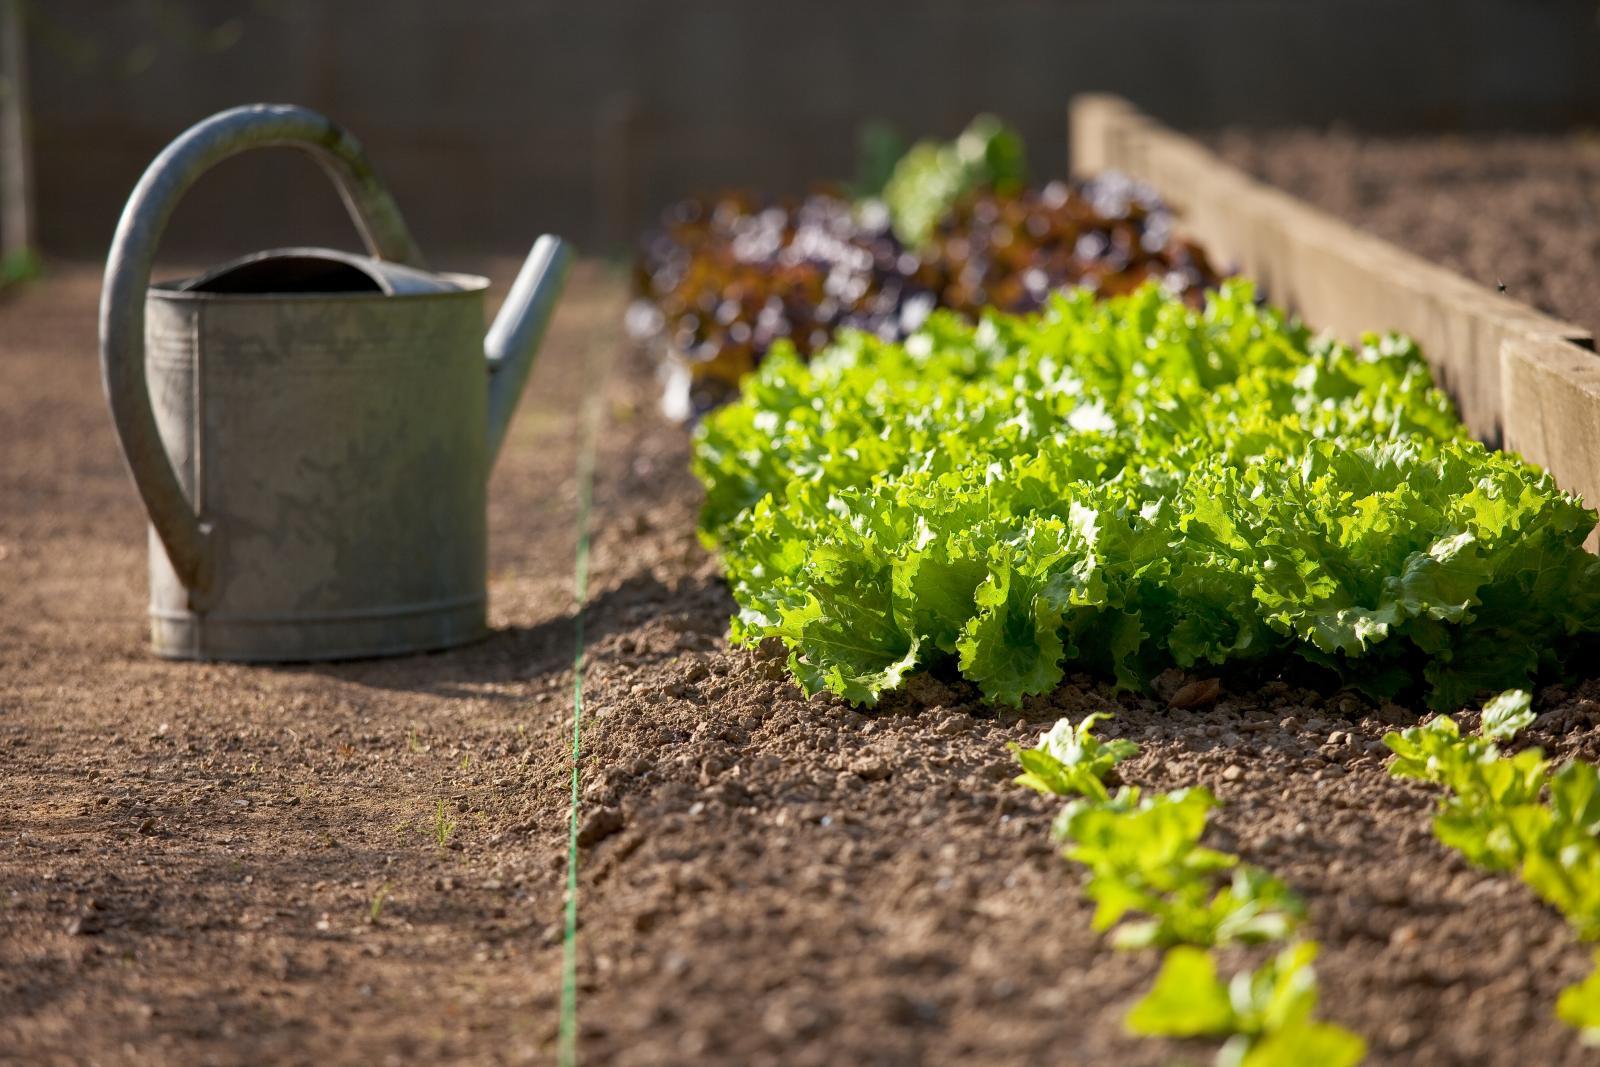 Sowing vegetables